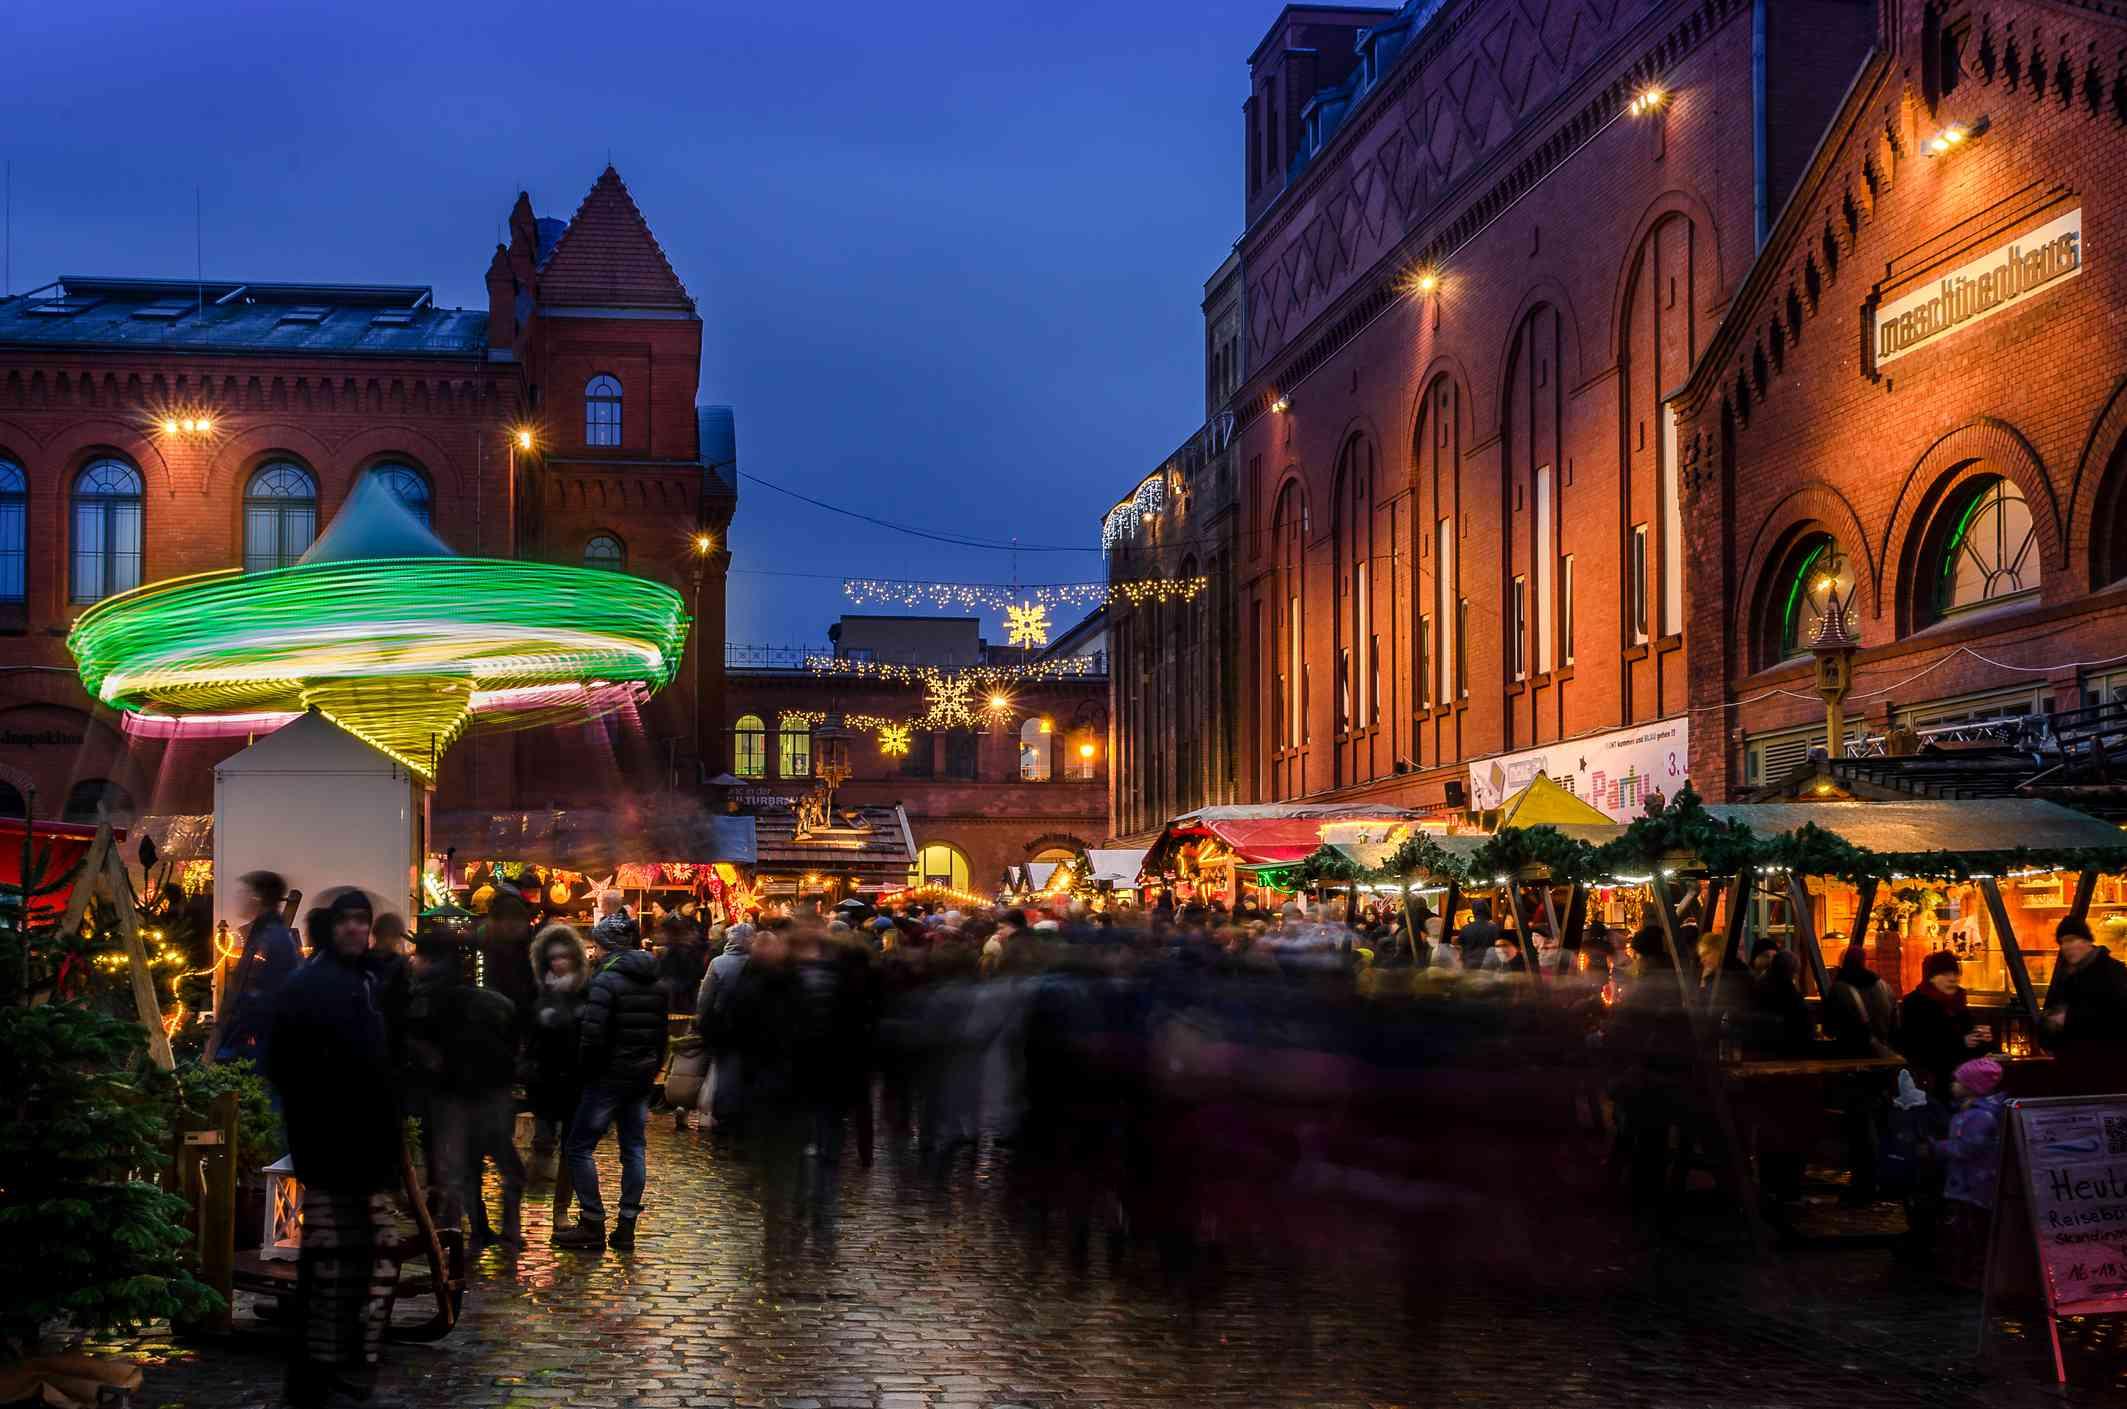 Lucia Christmas Market in Berlin